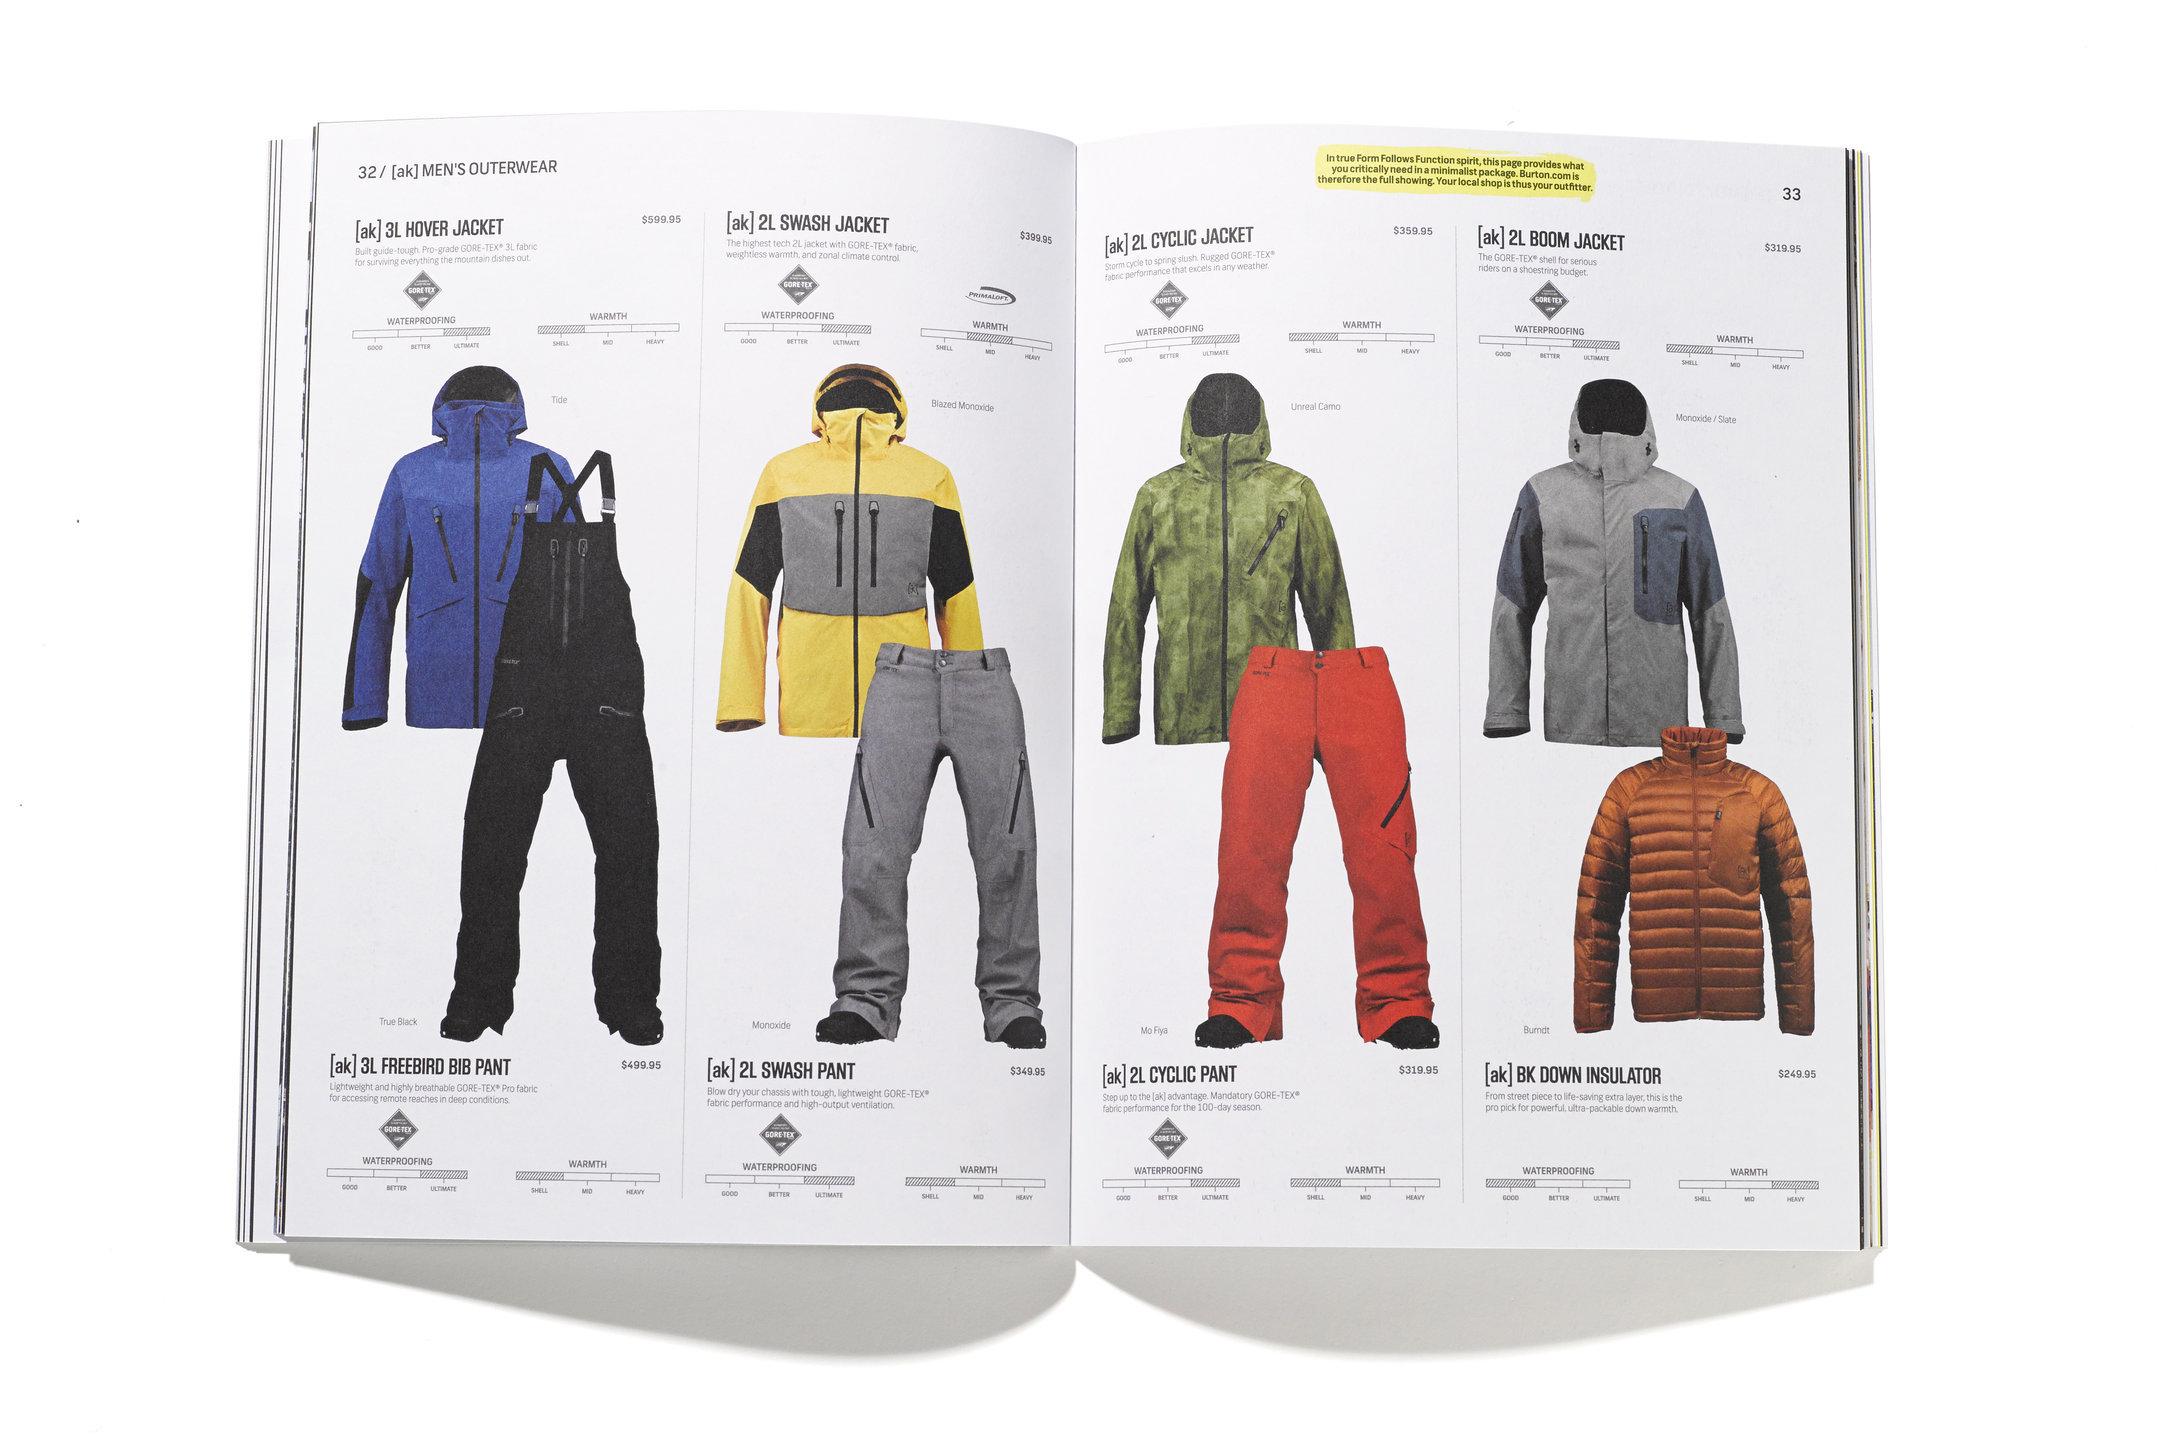 Burton Snowboards: Consumer catalog